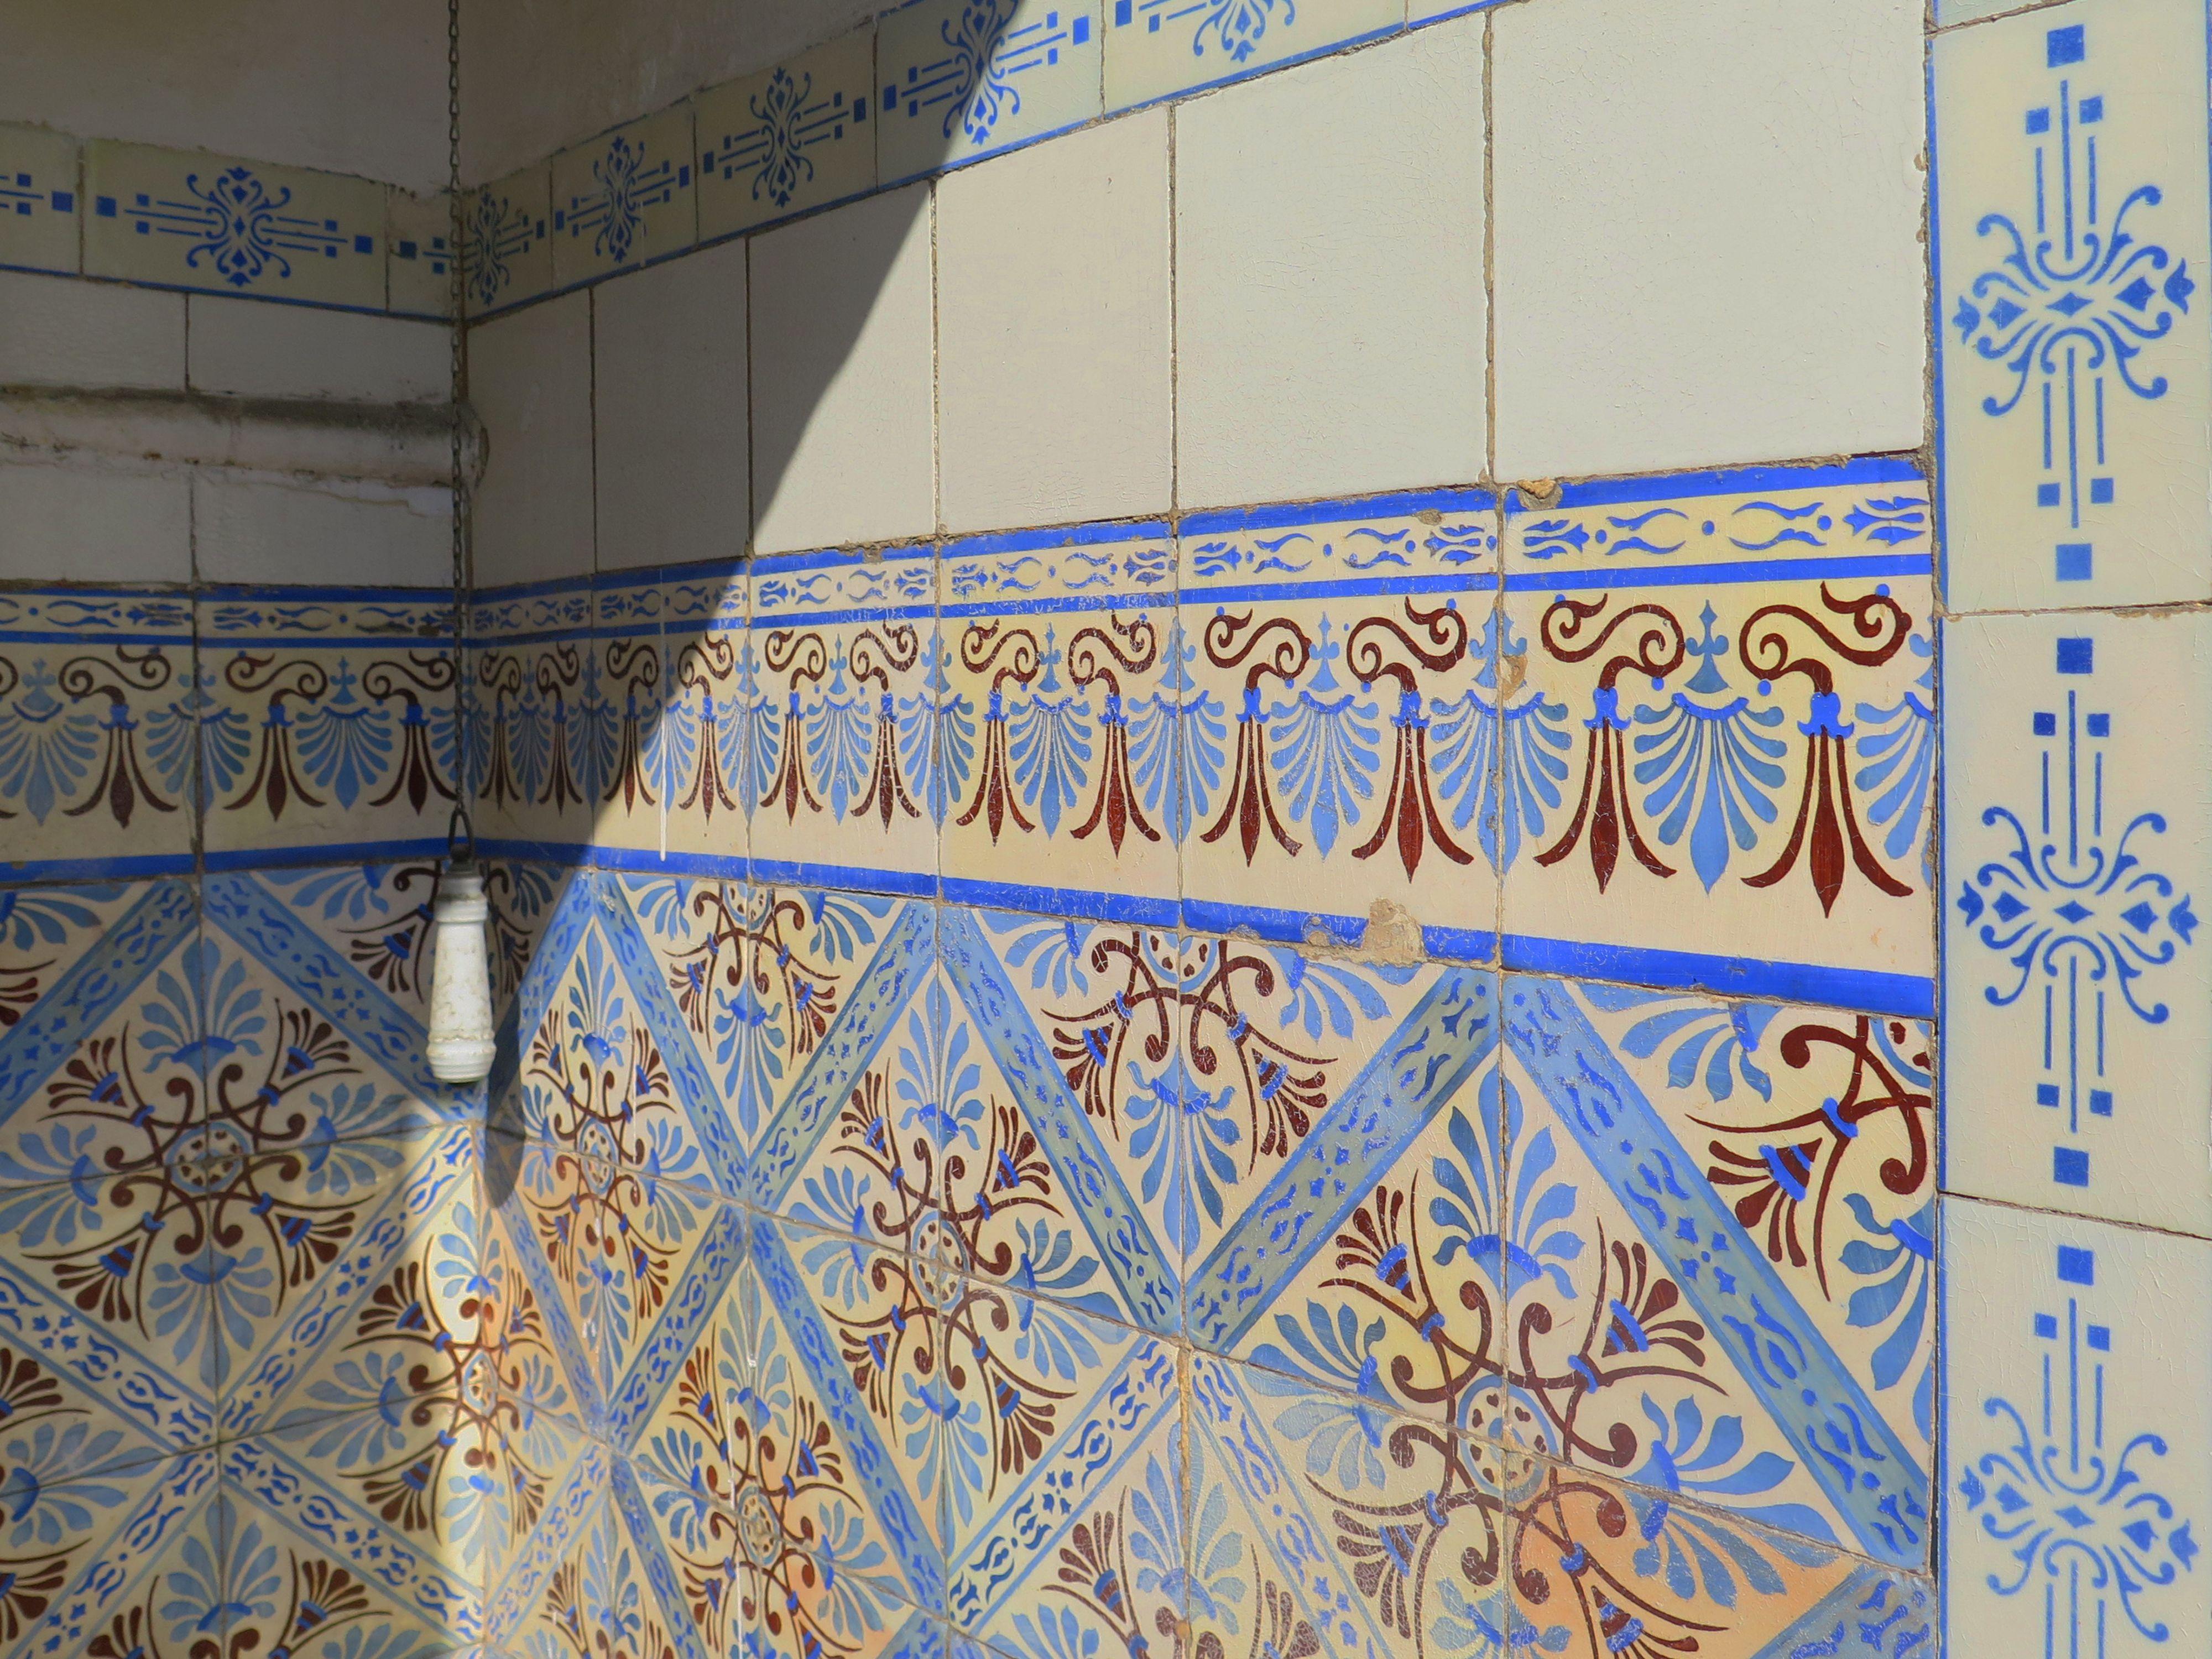 Oporto's ceramic tiles a bathroom. Piastrelle